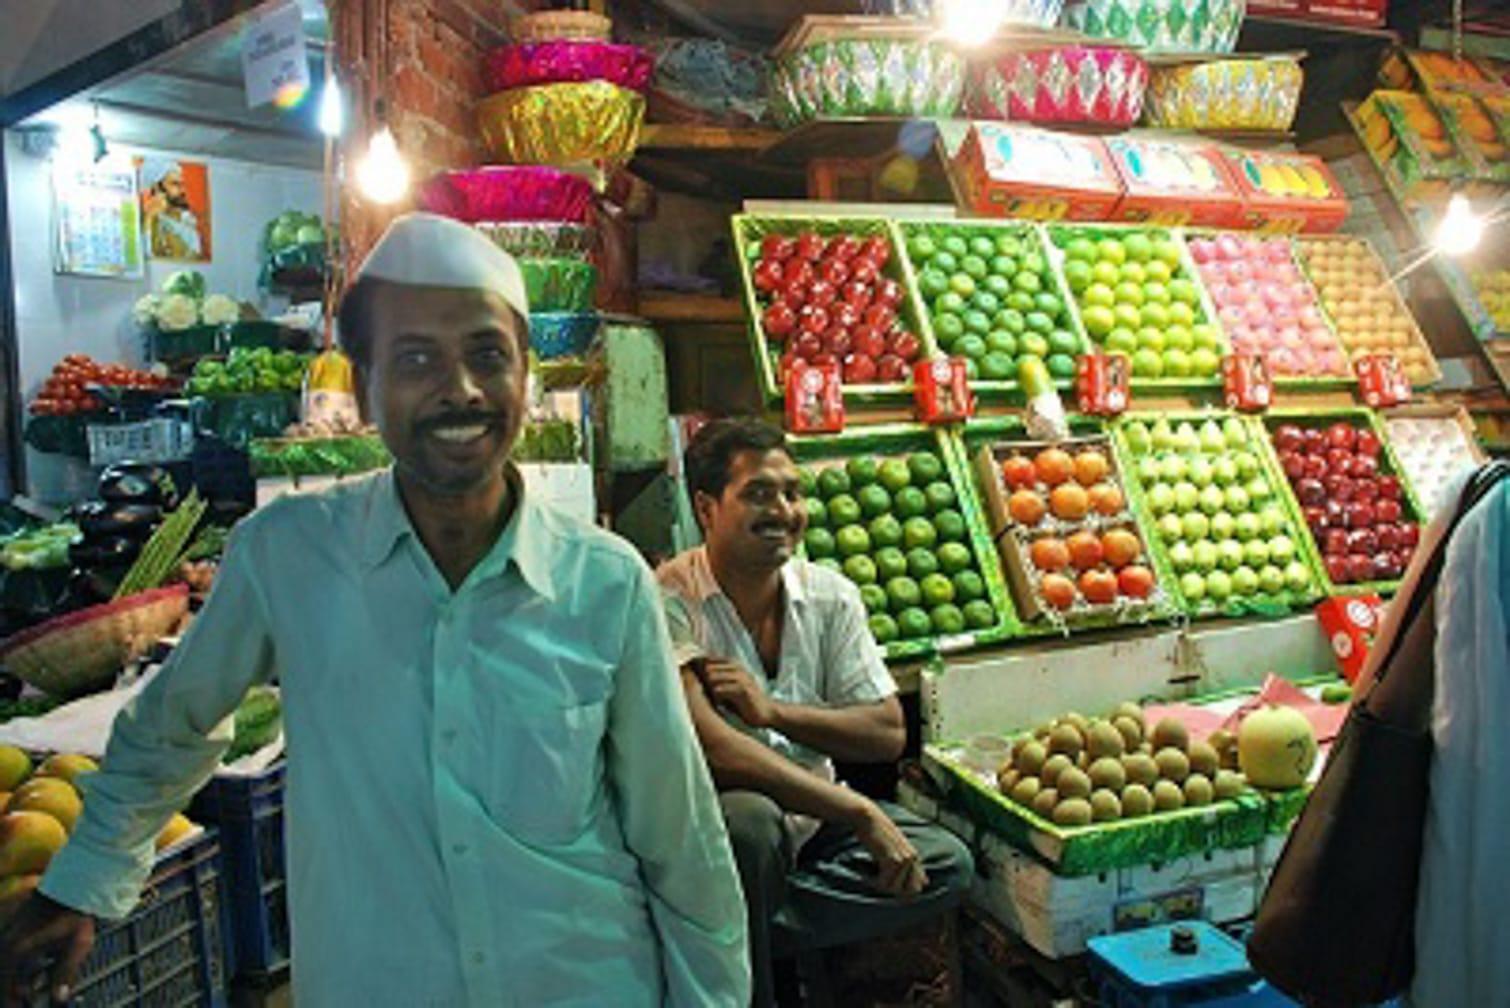 Produce vendor on the Darjeeling Mail: Mumbai to Kolkata by Luxury Deccan Odyssey Train journey